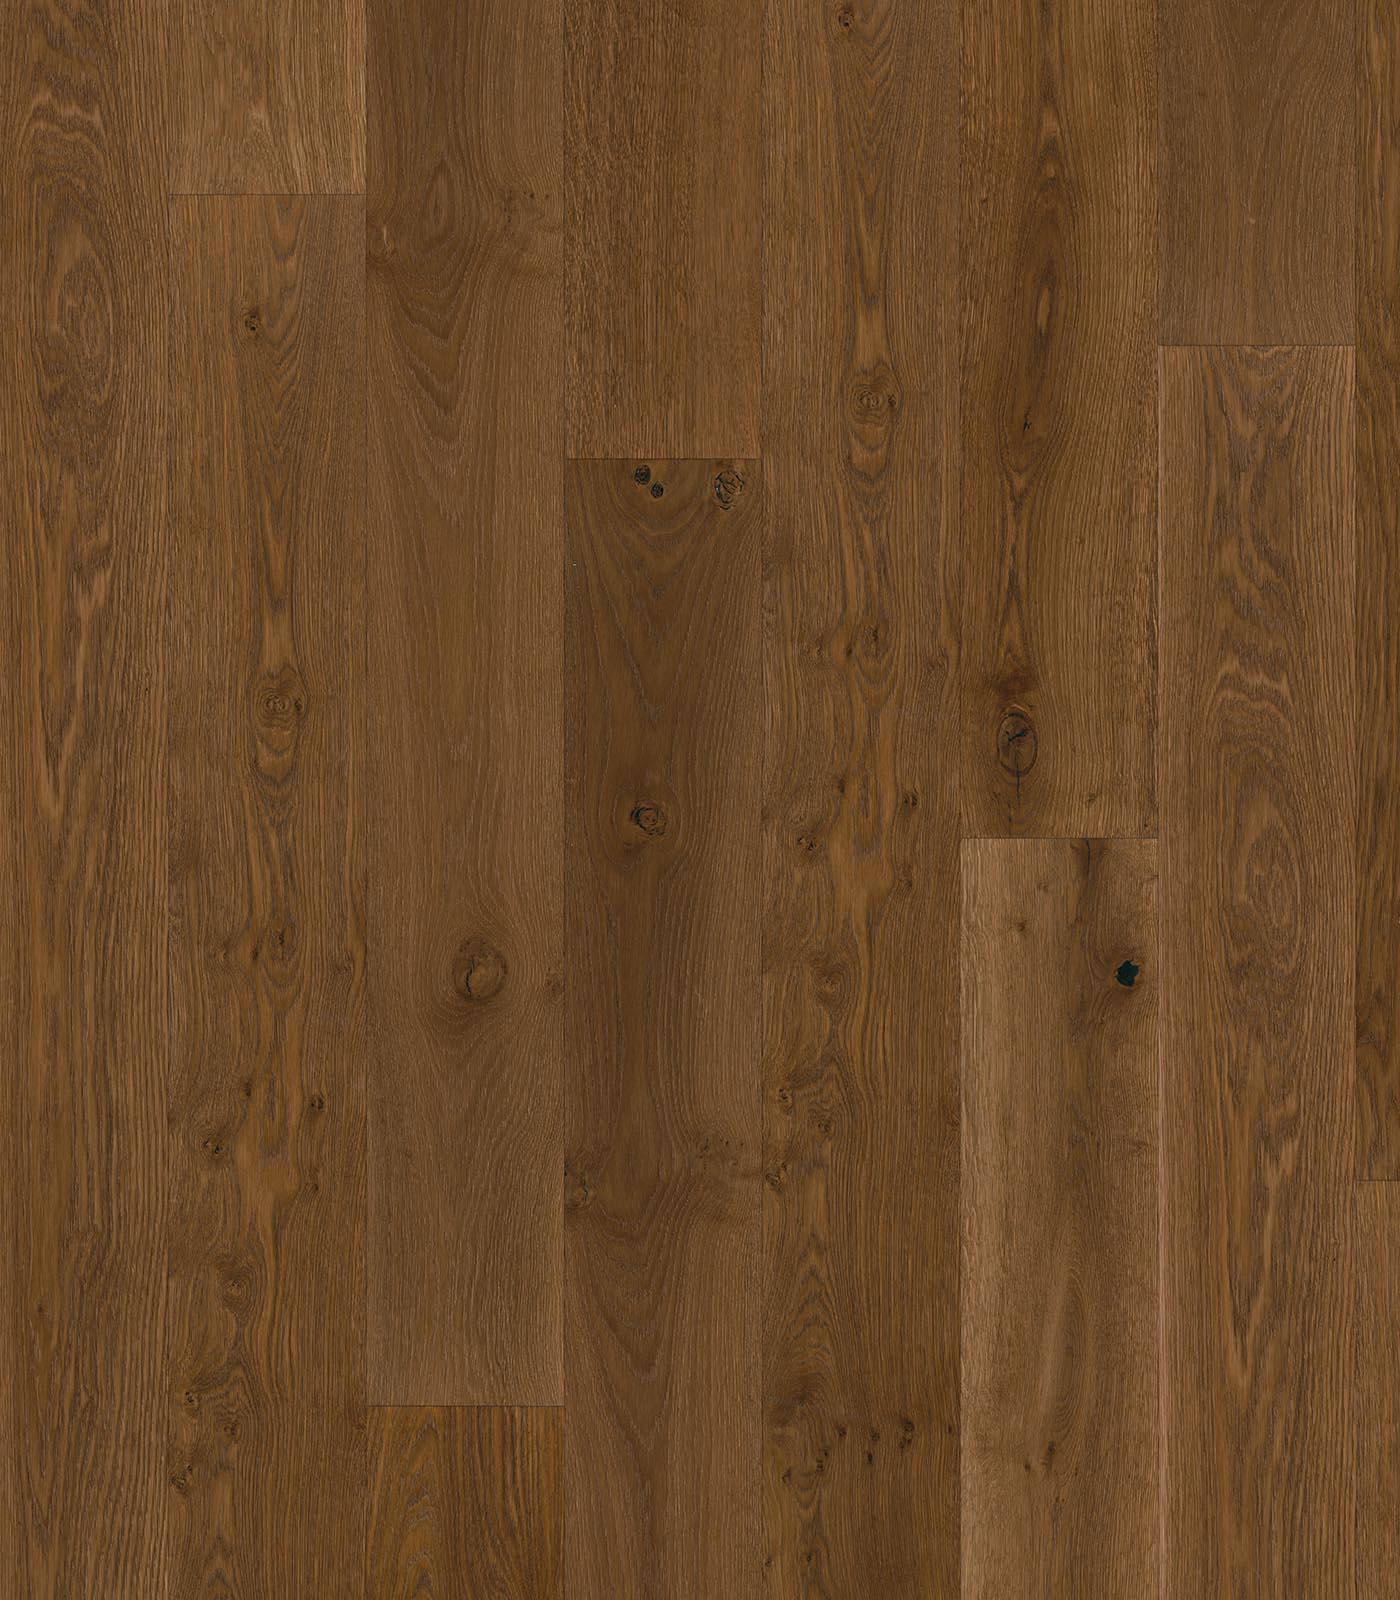 Monterey-Lifestyle Collection-European Oak Floors-flat